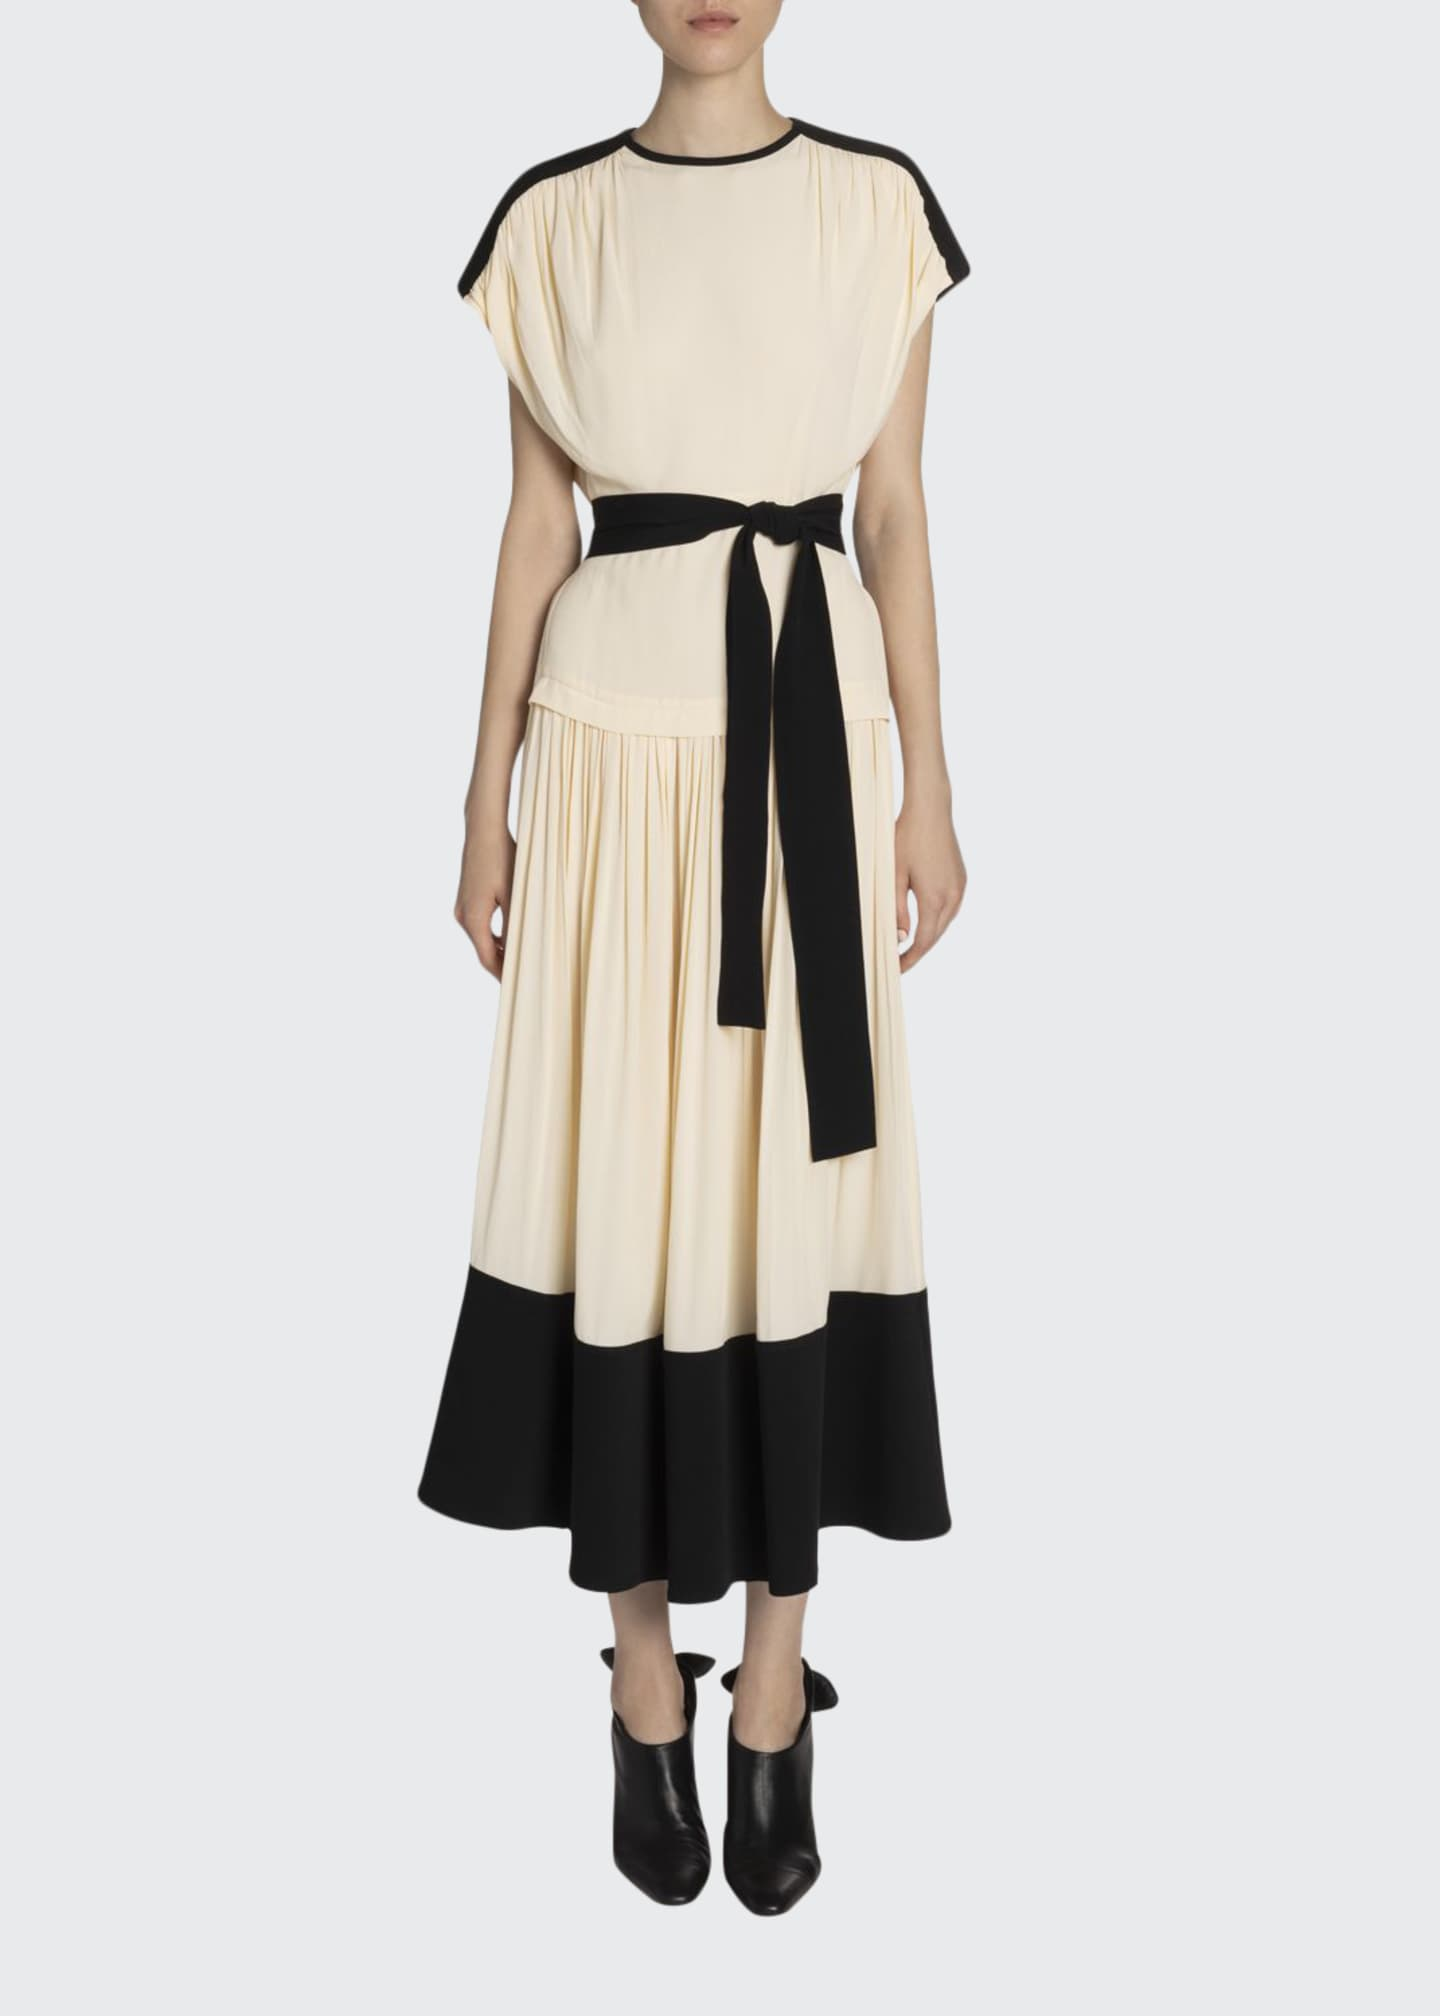 Proenza Schouler Crepe Belted Maxi Dress